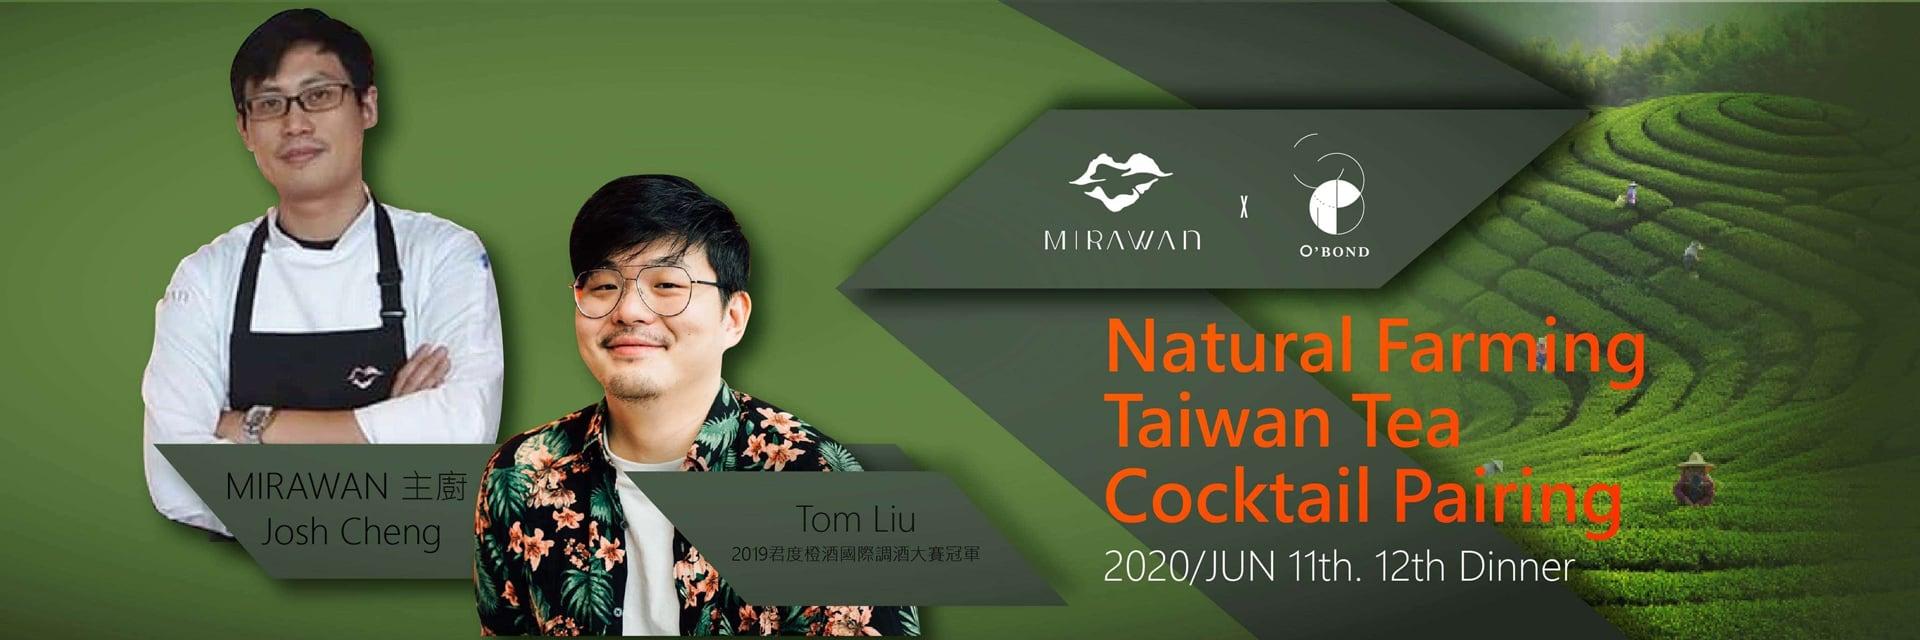 NATURAL FARMING TAIWAN TEA COCKTAIL PAIRING